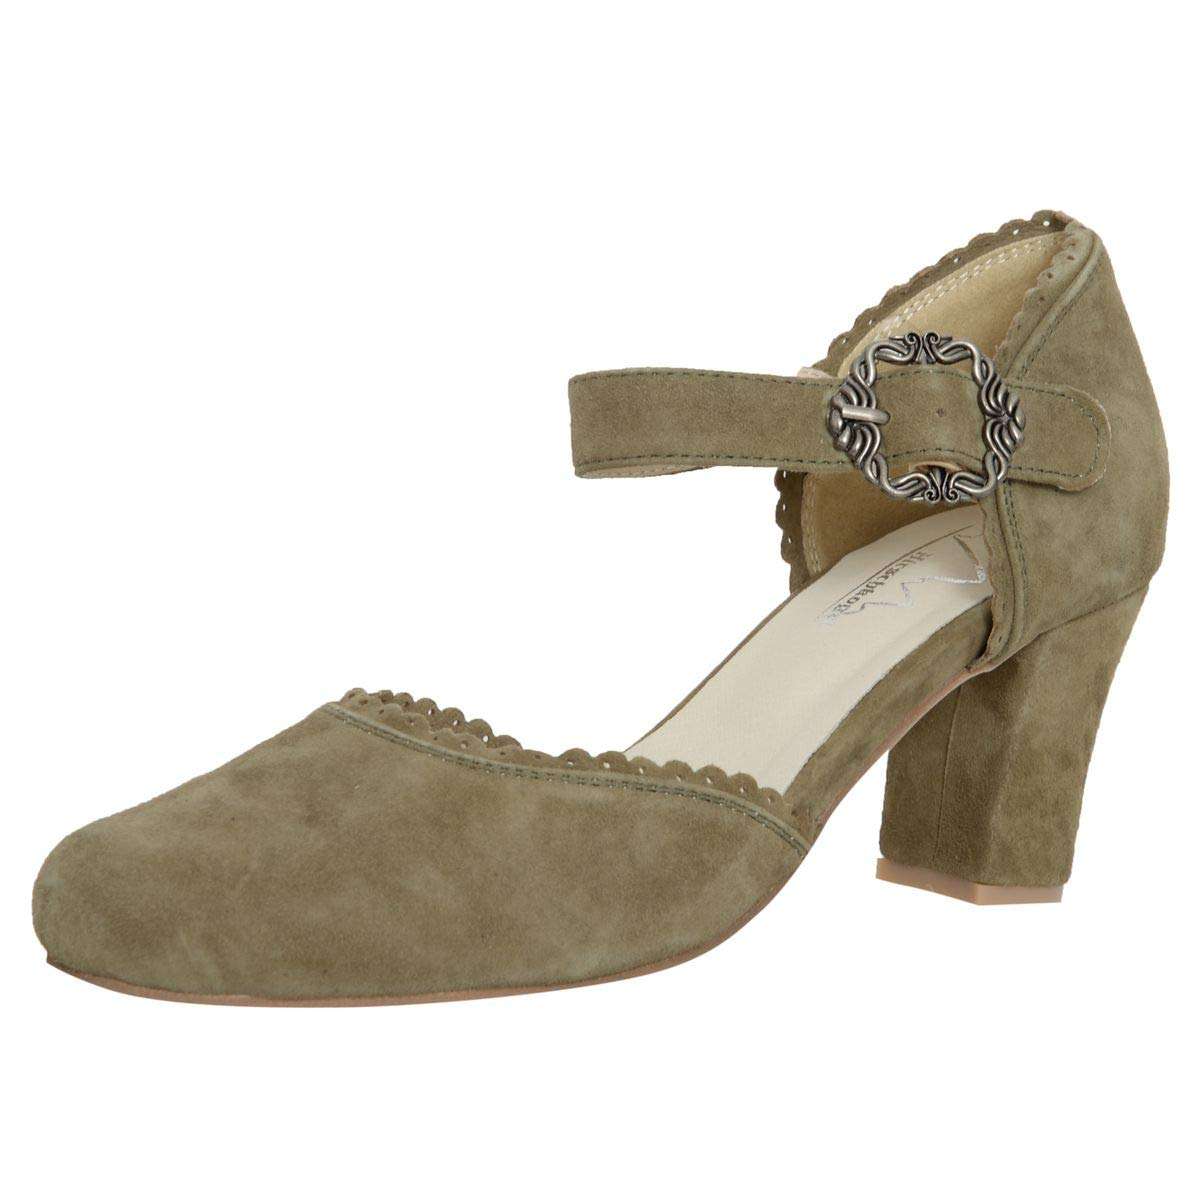 hot sale online 5c98d 8c227 HIRSCHKOGEL Damen Dirndl-Schuhe Pumps Kummerower See ...